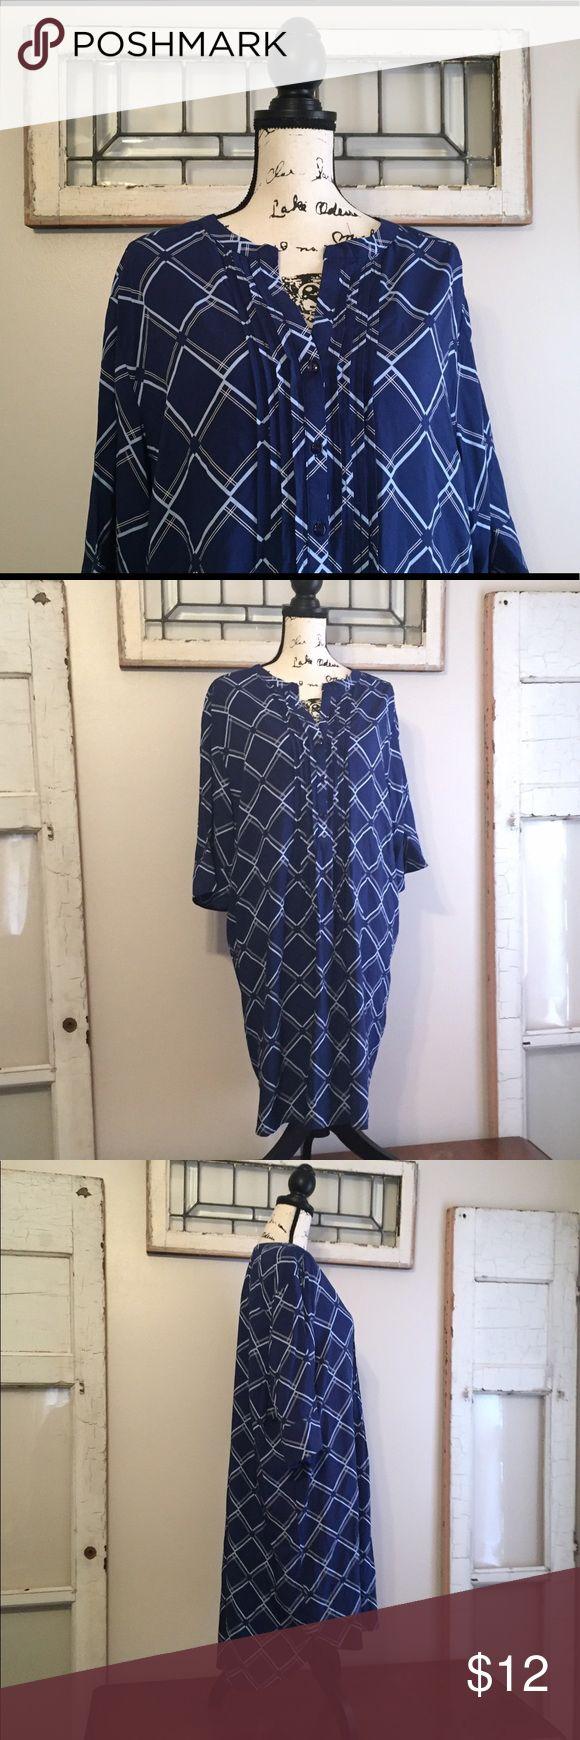 "NWOT Liz Claiborne Nightgown NWOT  Nightshirt - Nightgown - fab muumuu that's super soft, and Lightweight . Made of rayon, machine washable.                                                                         Tag reads size XXL                                                                Measures  26"" armpit to armpit                                             39"" shoulder to hem Liz Claiborne Intimates & Sleepwear"